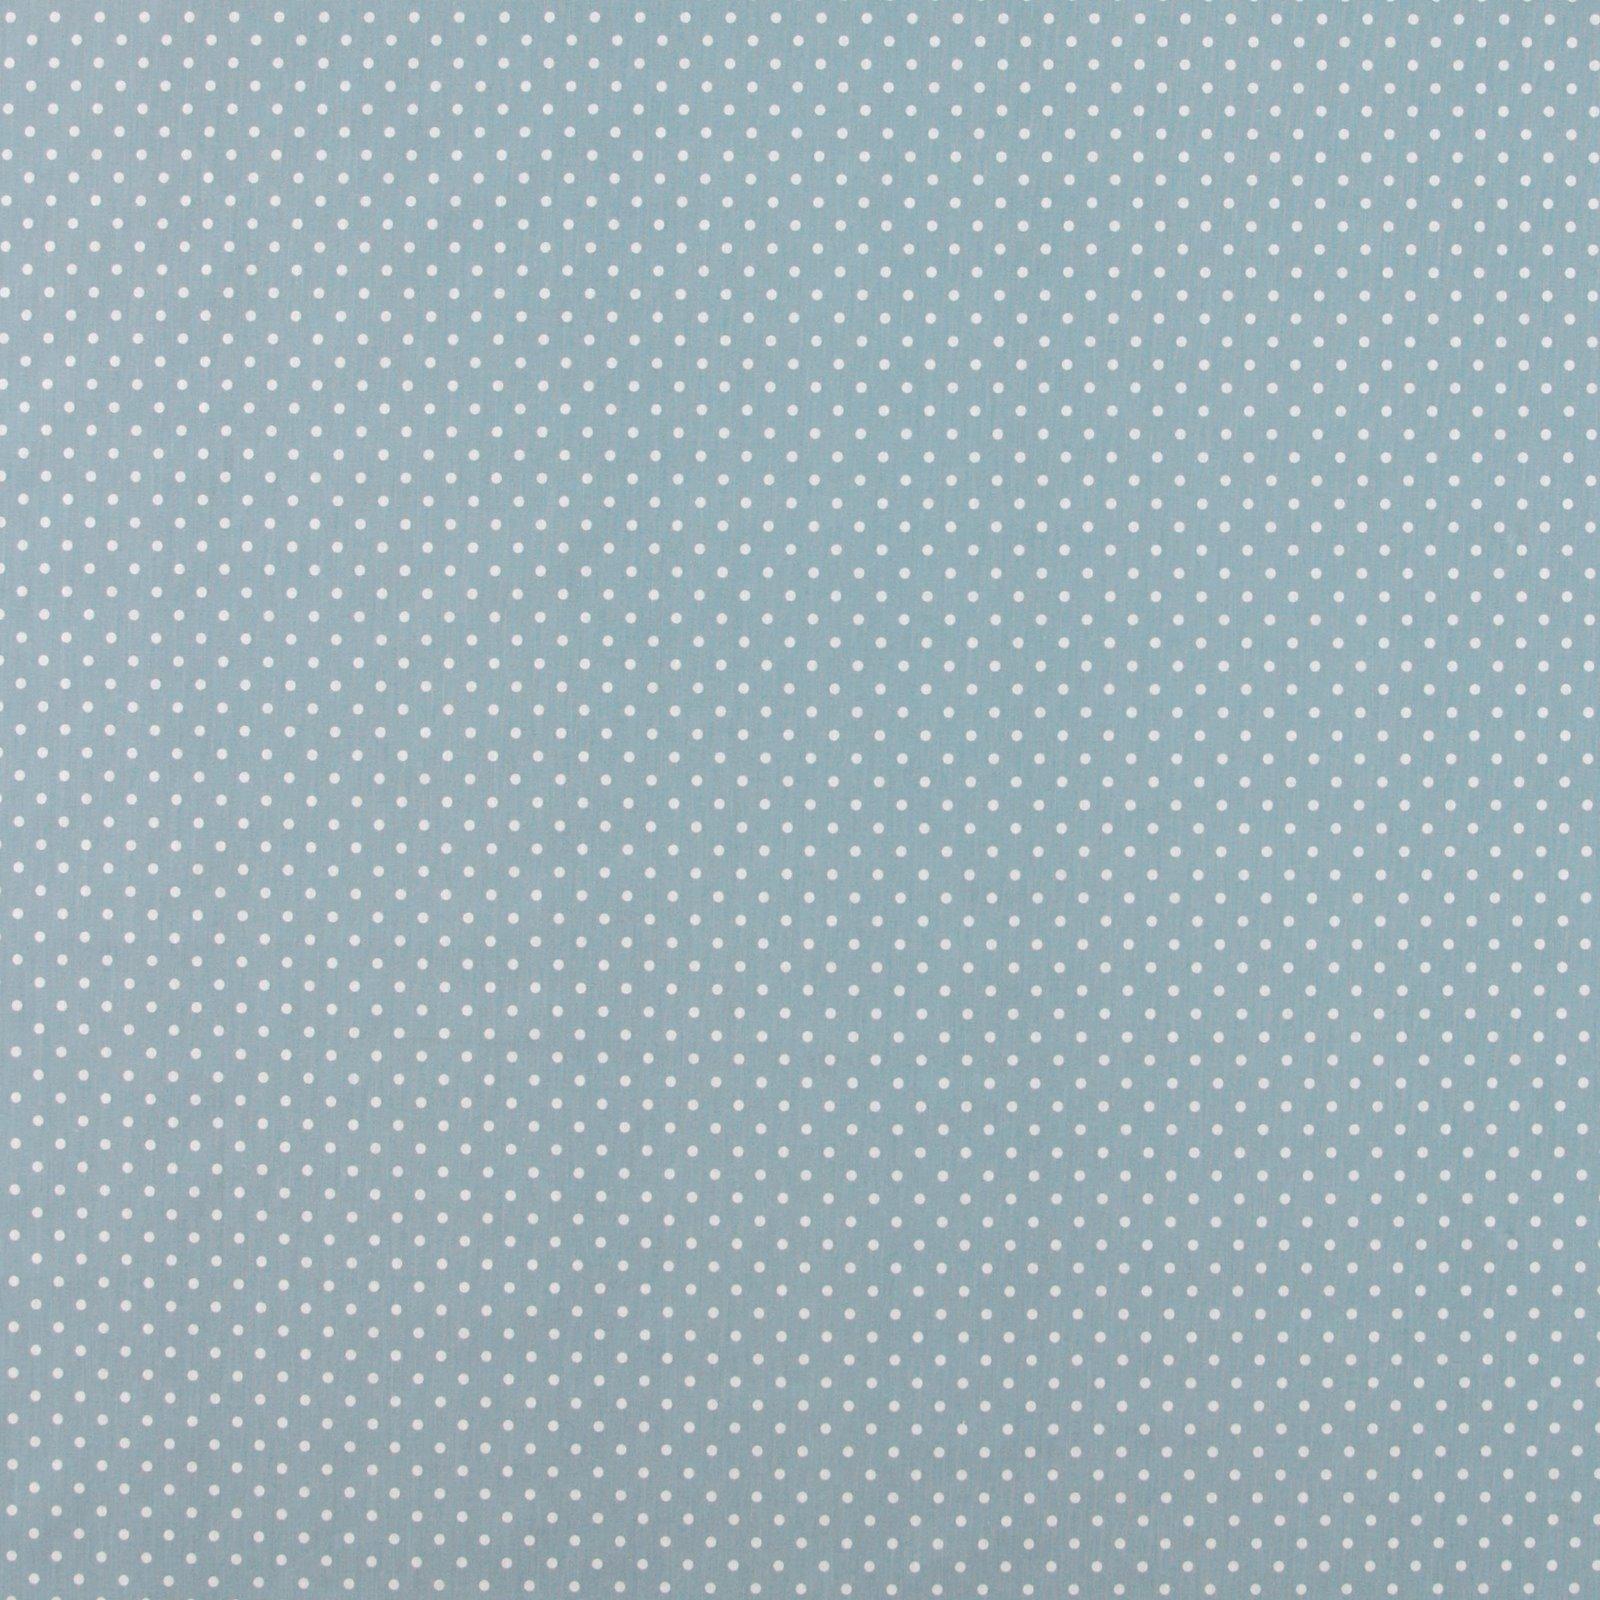 Cotton dusty blue w white dots 790037_pack_sp